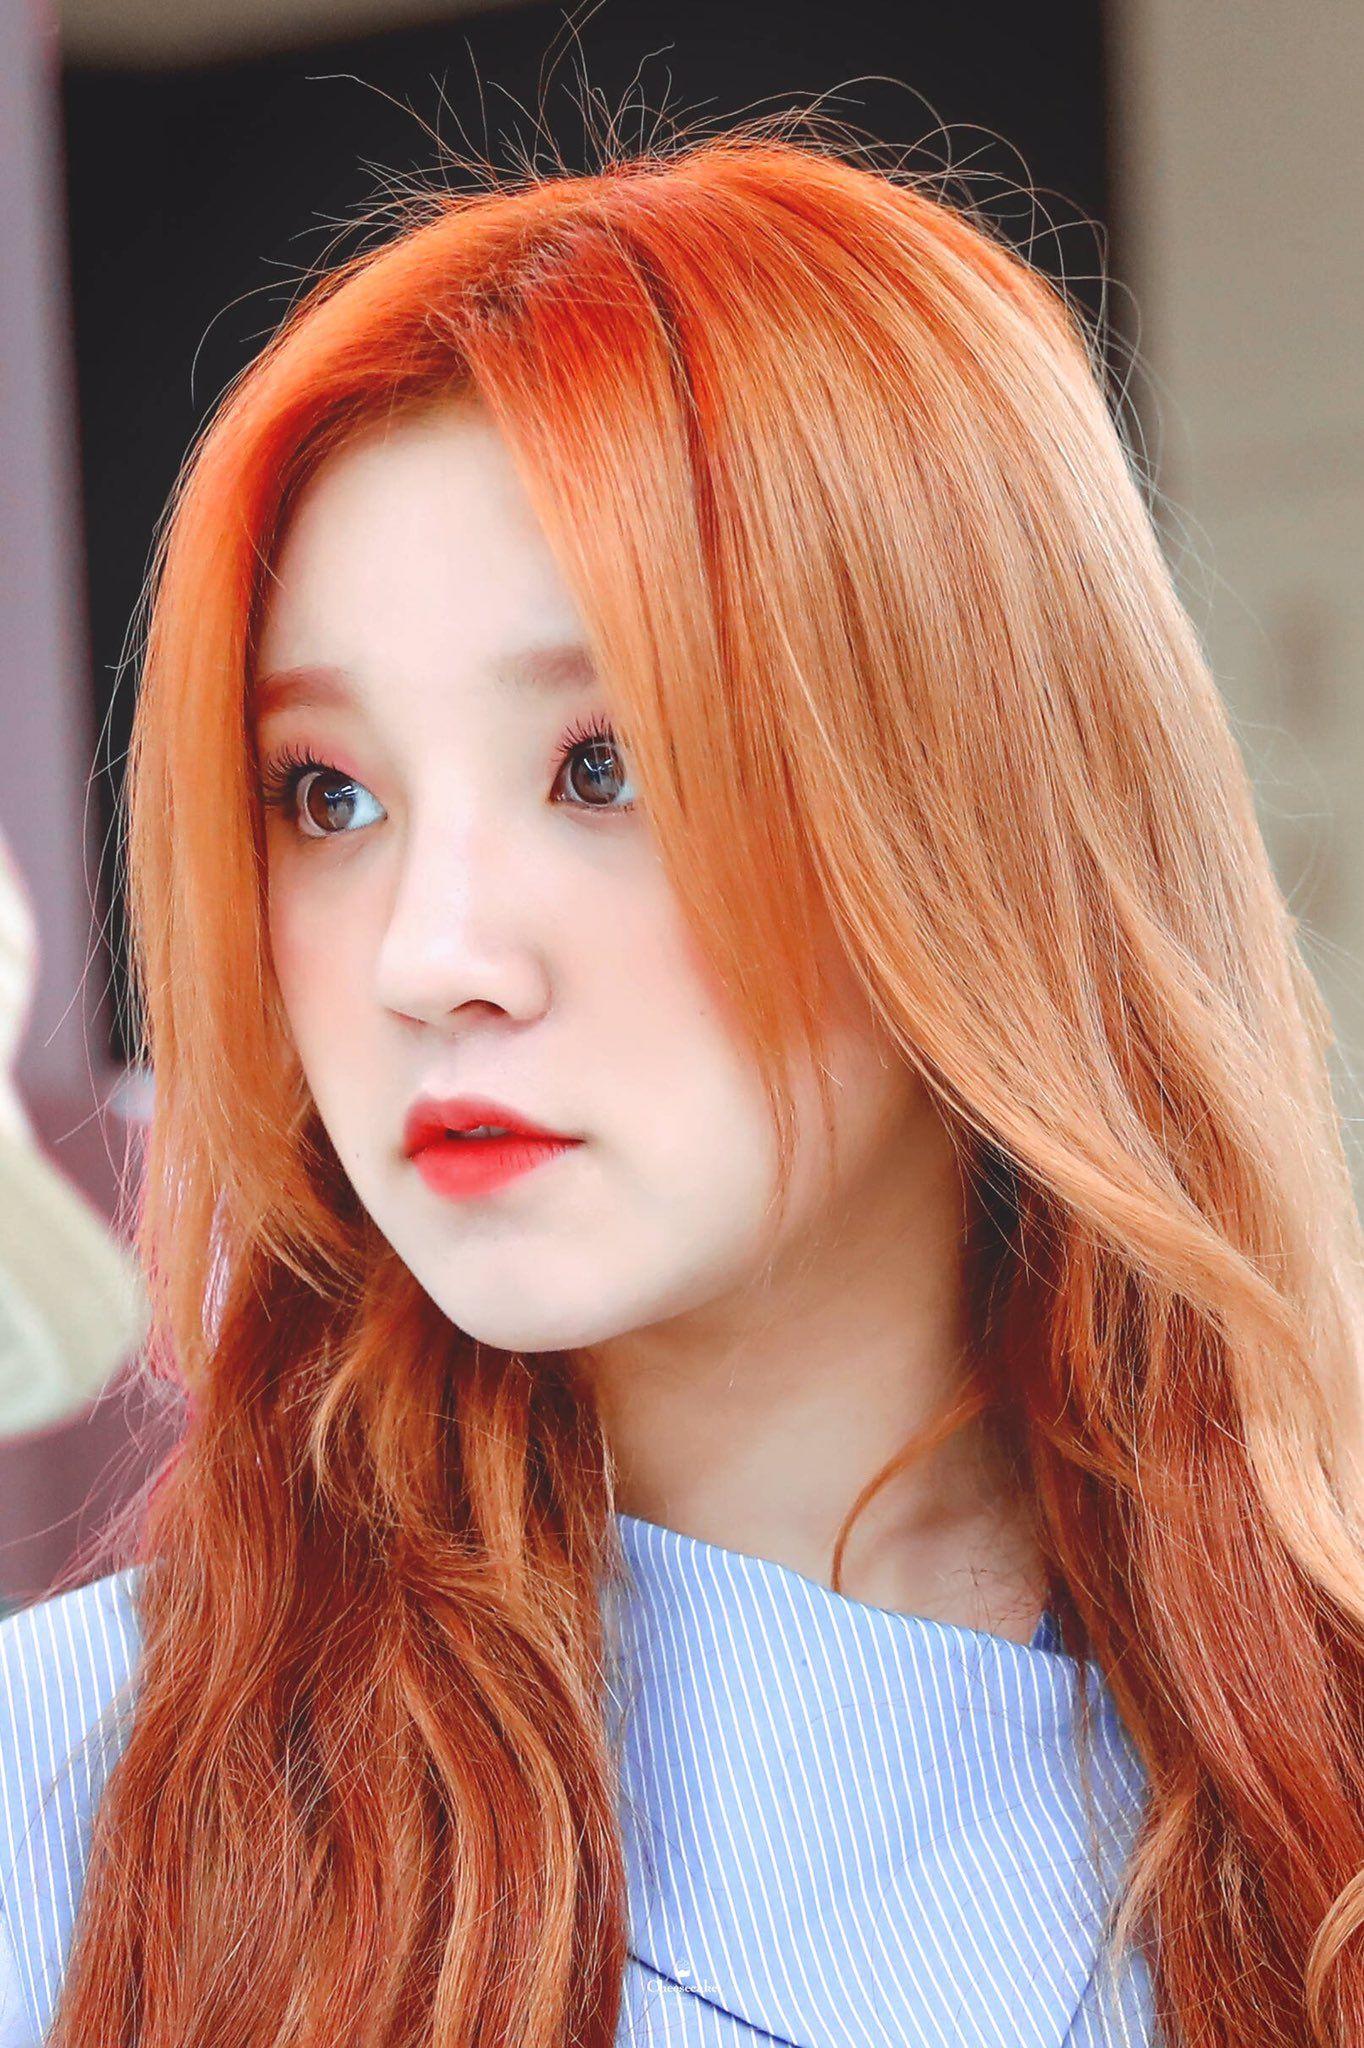 Yuqi Kpop Kdrama Bts Exo Kpoparmy Kpop Hair Color Kpop Hair Hairstyle